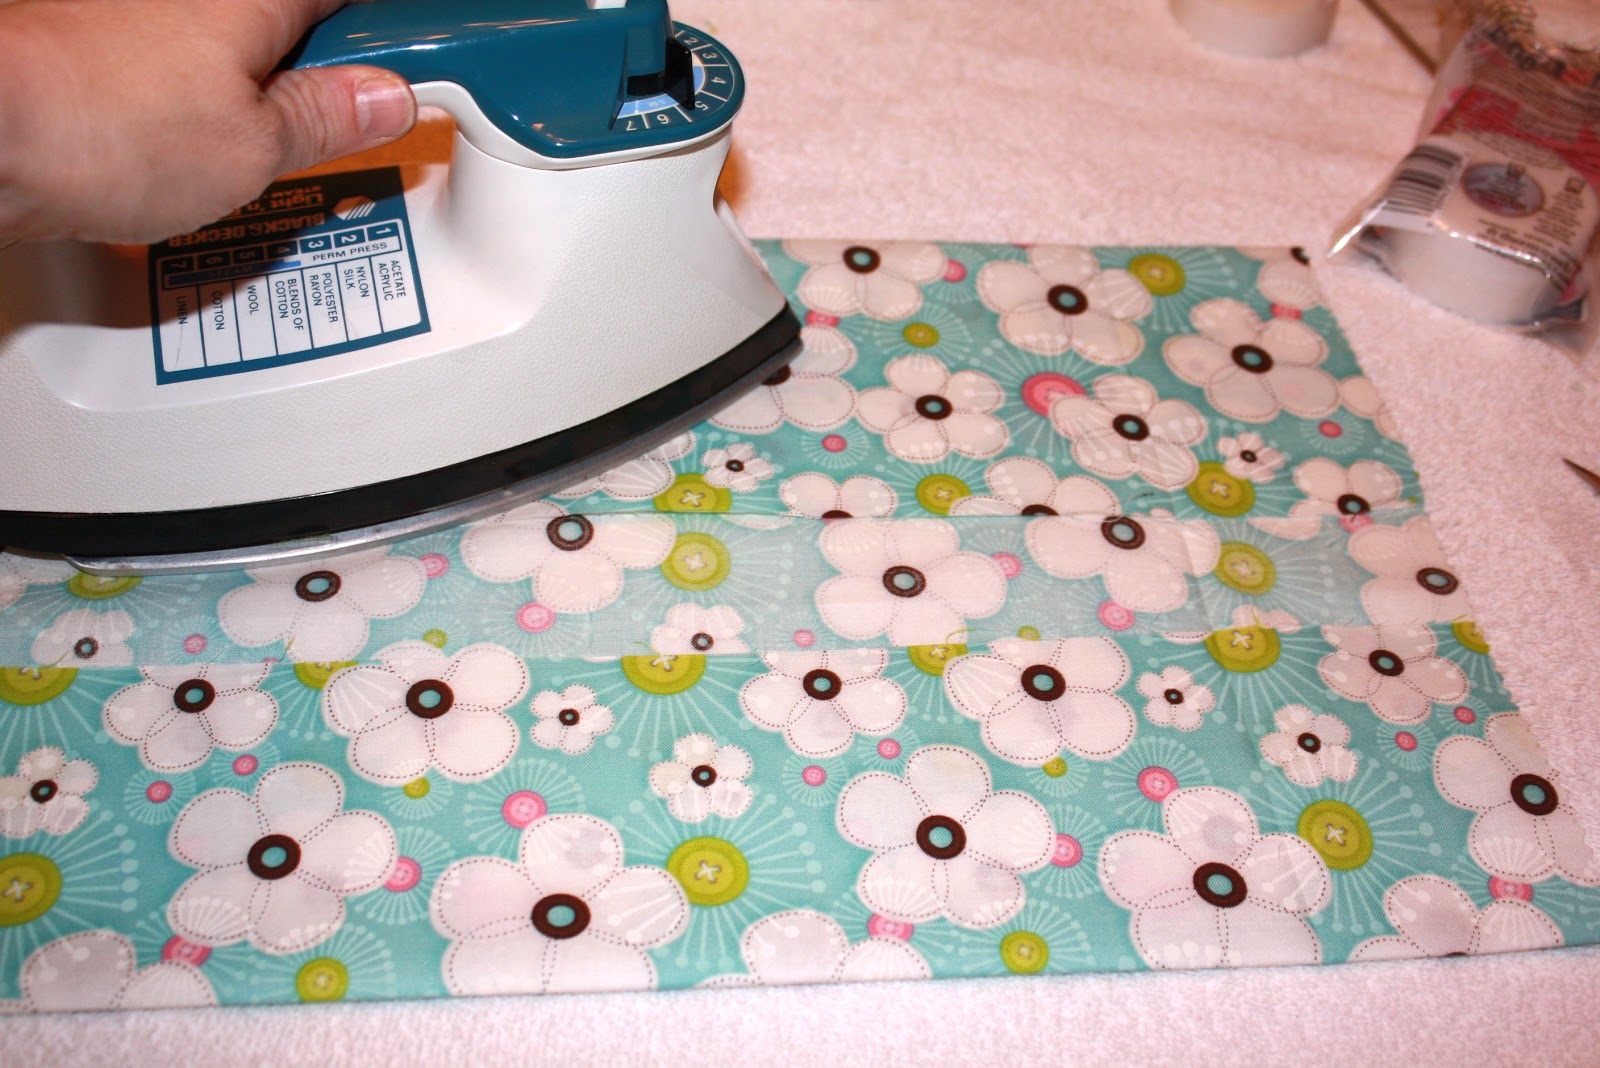 Fabric Book Cover No Sew : Heather rosas illustration super easy no sew fabric book